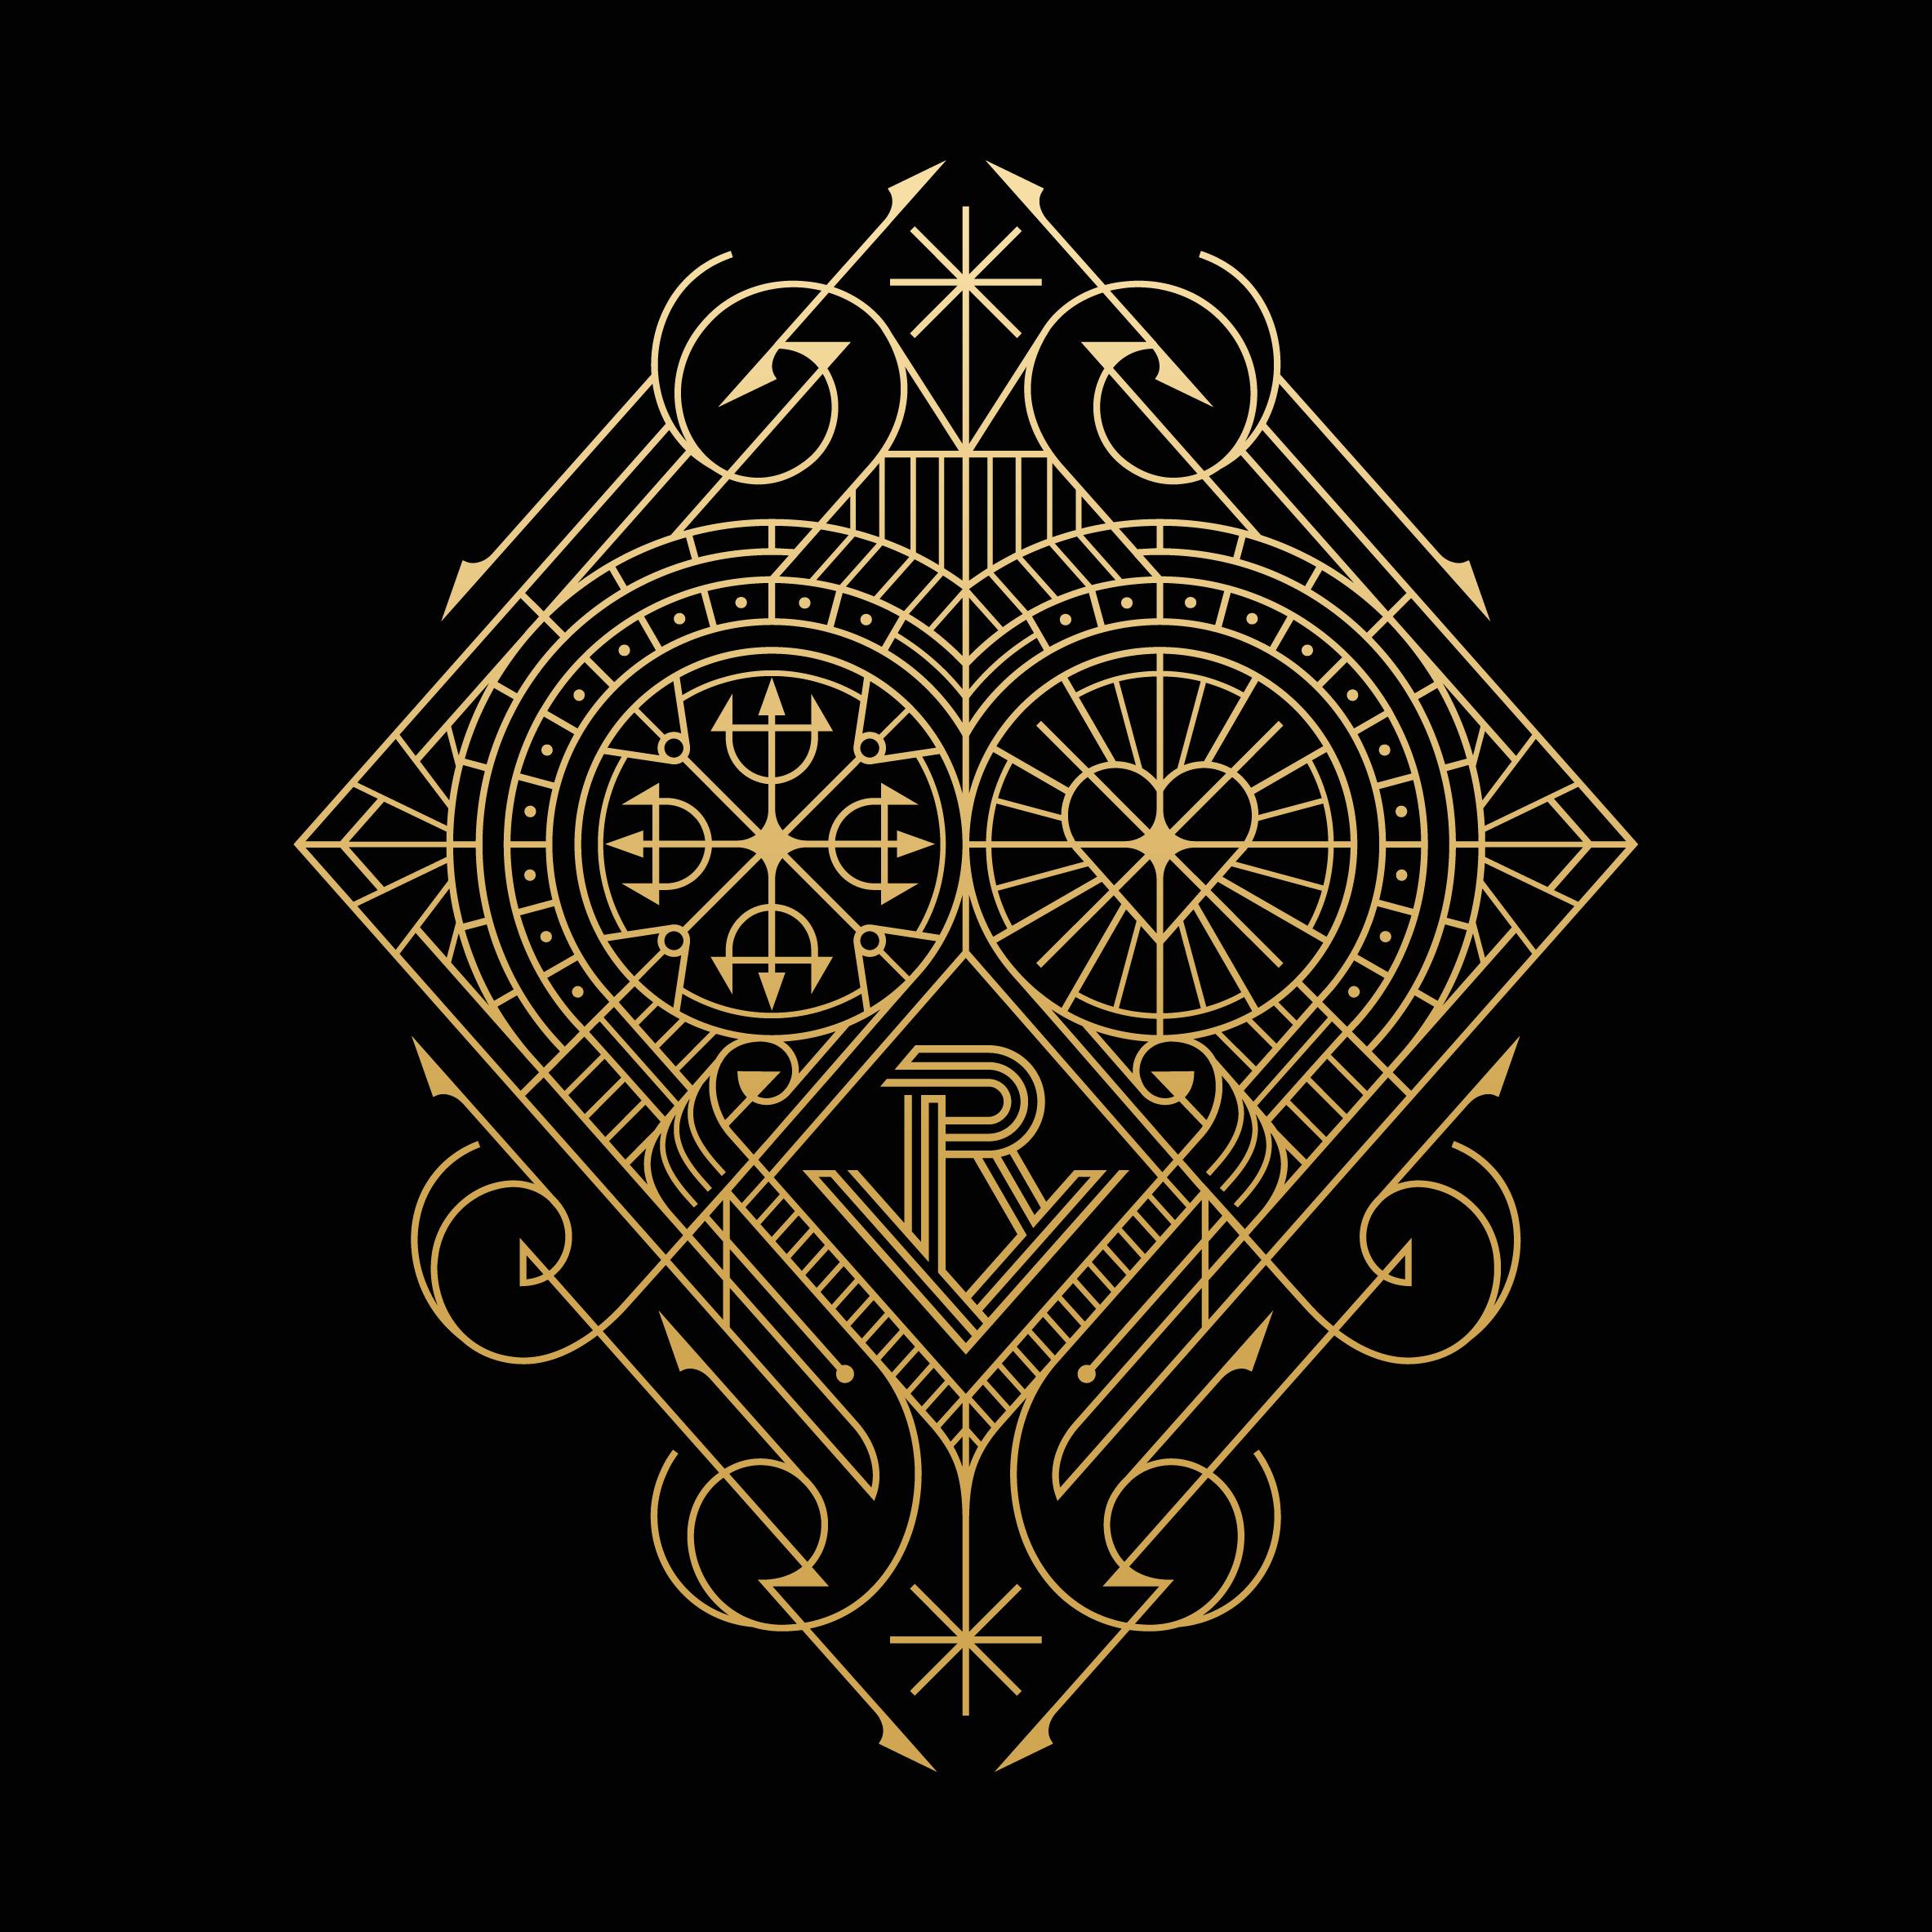 VuDuRvR Logo/Image design